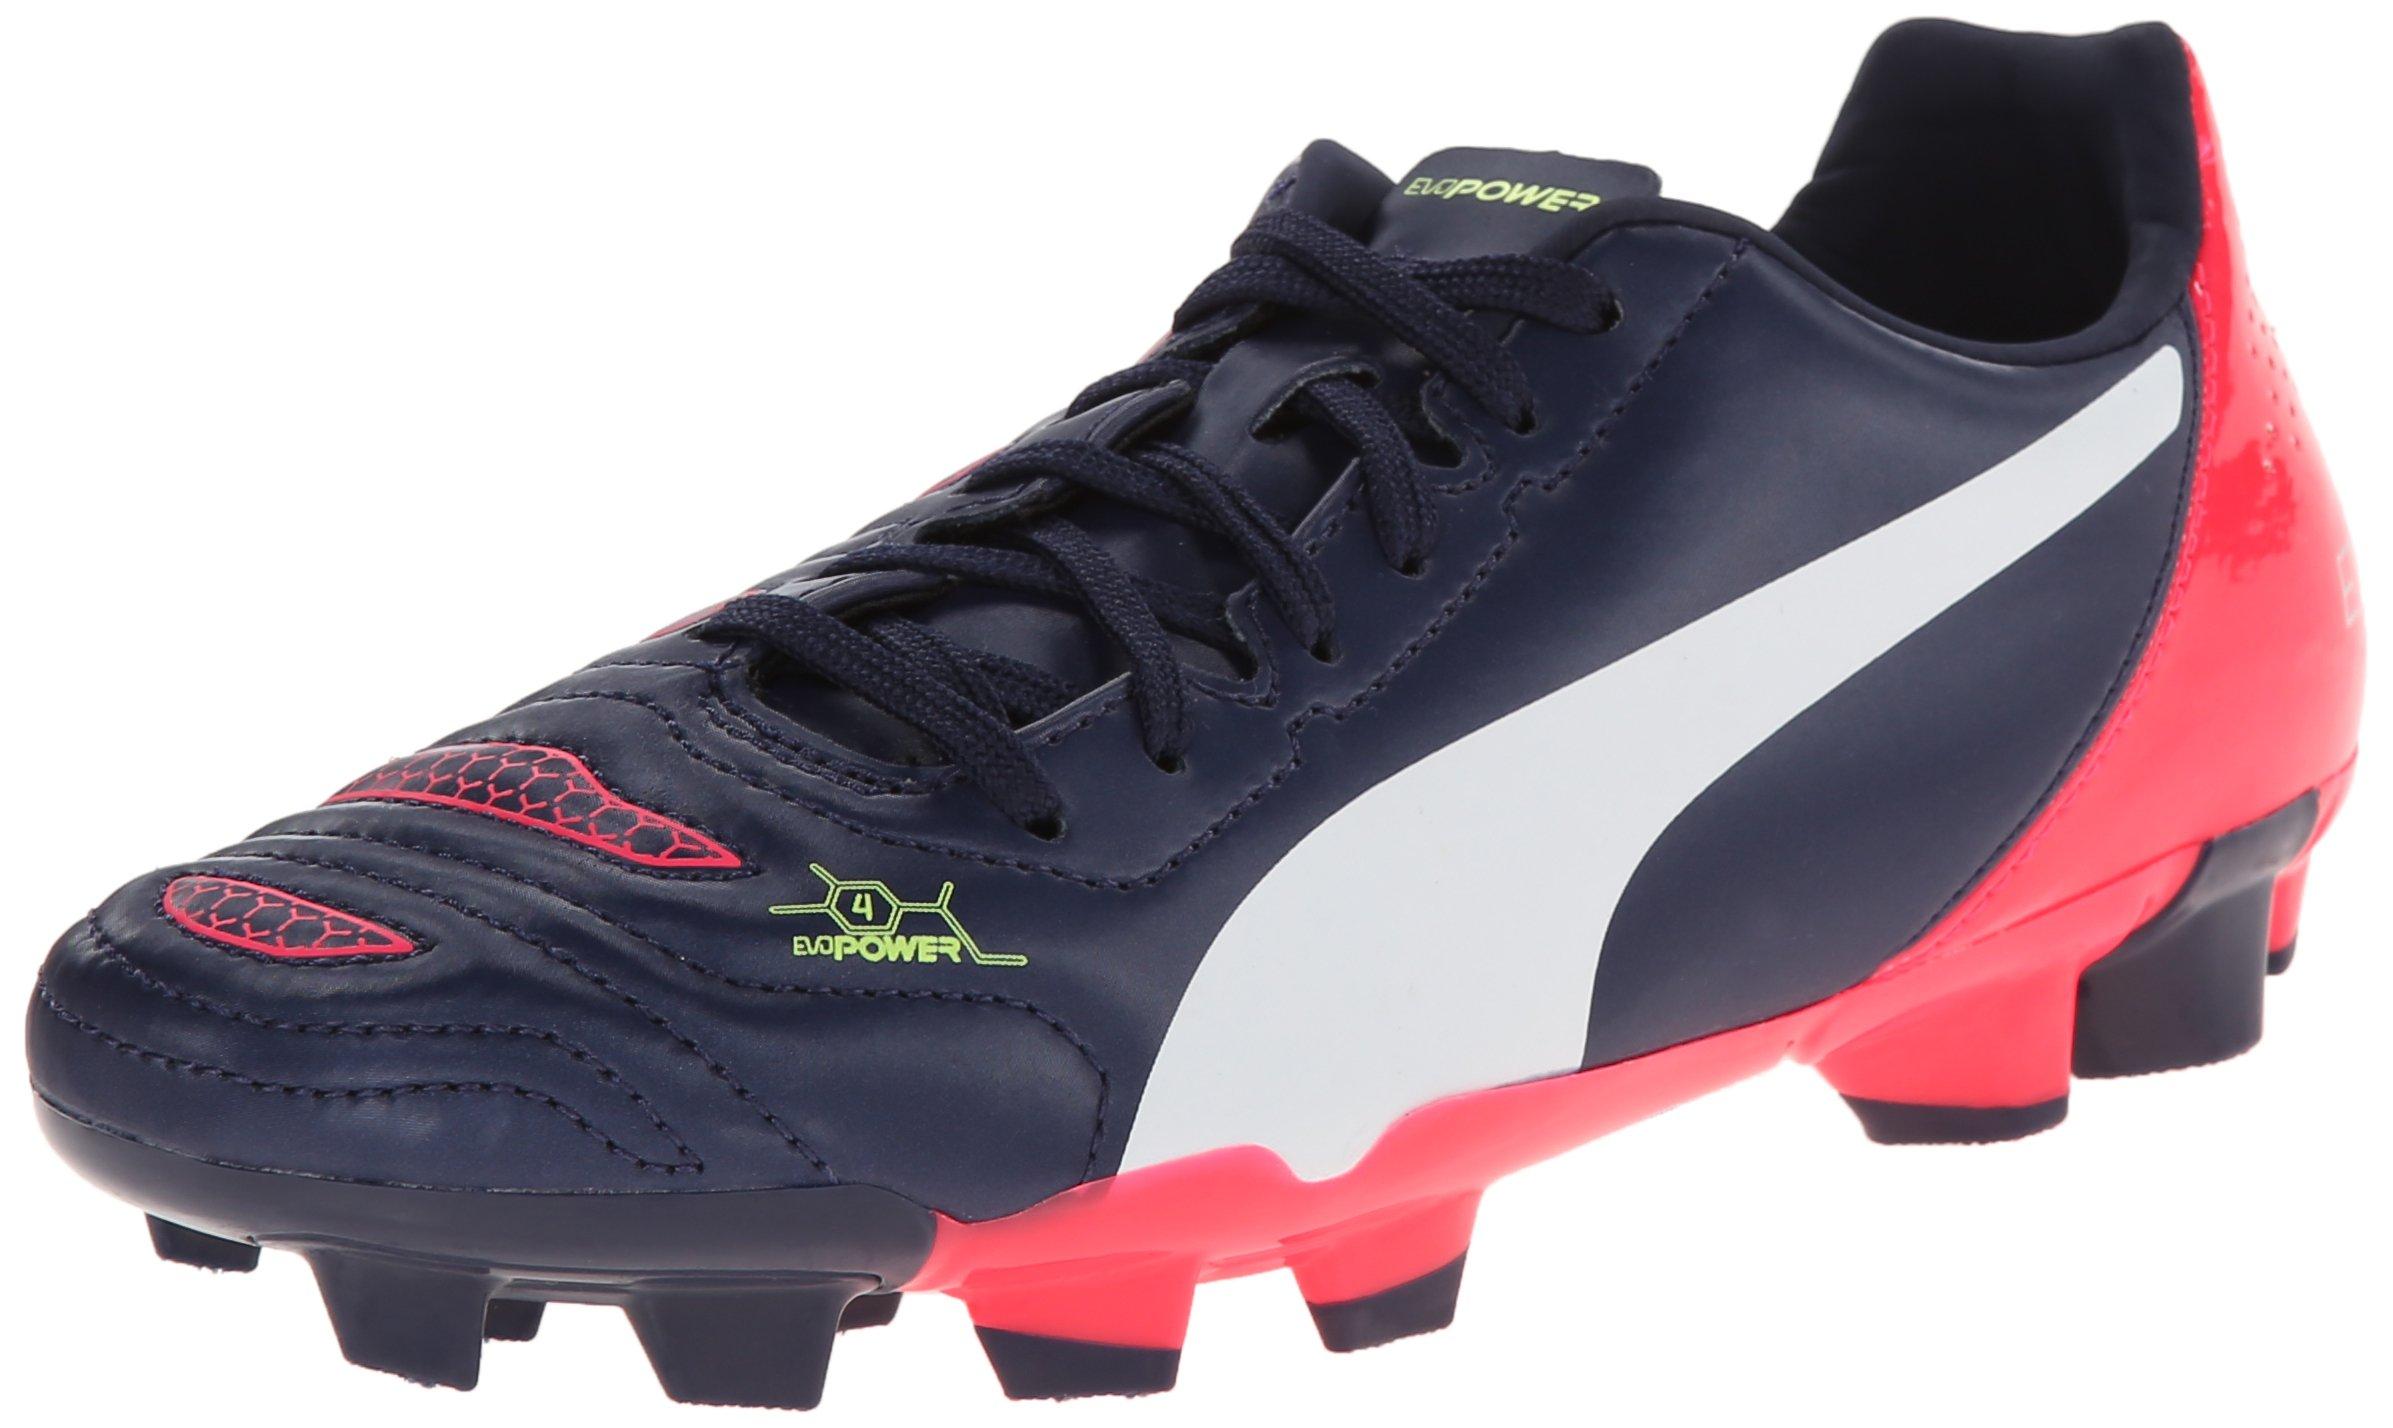 PUMA Evopower 4.2 Firm Ground JR Soccer Shoe (Little Kid/Big Kid), Peacoat/White/Bright Plasma, 4 M US Big Kid